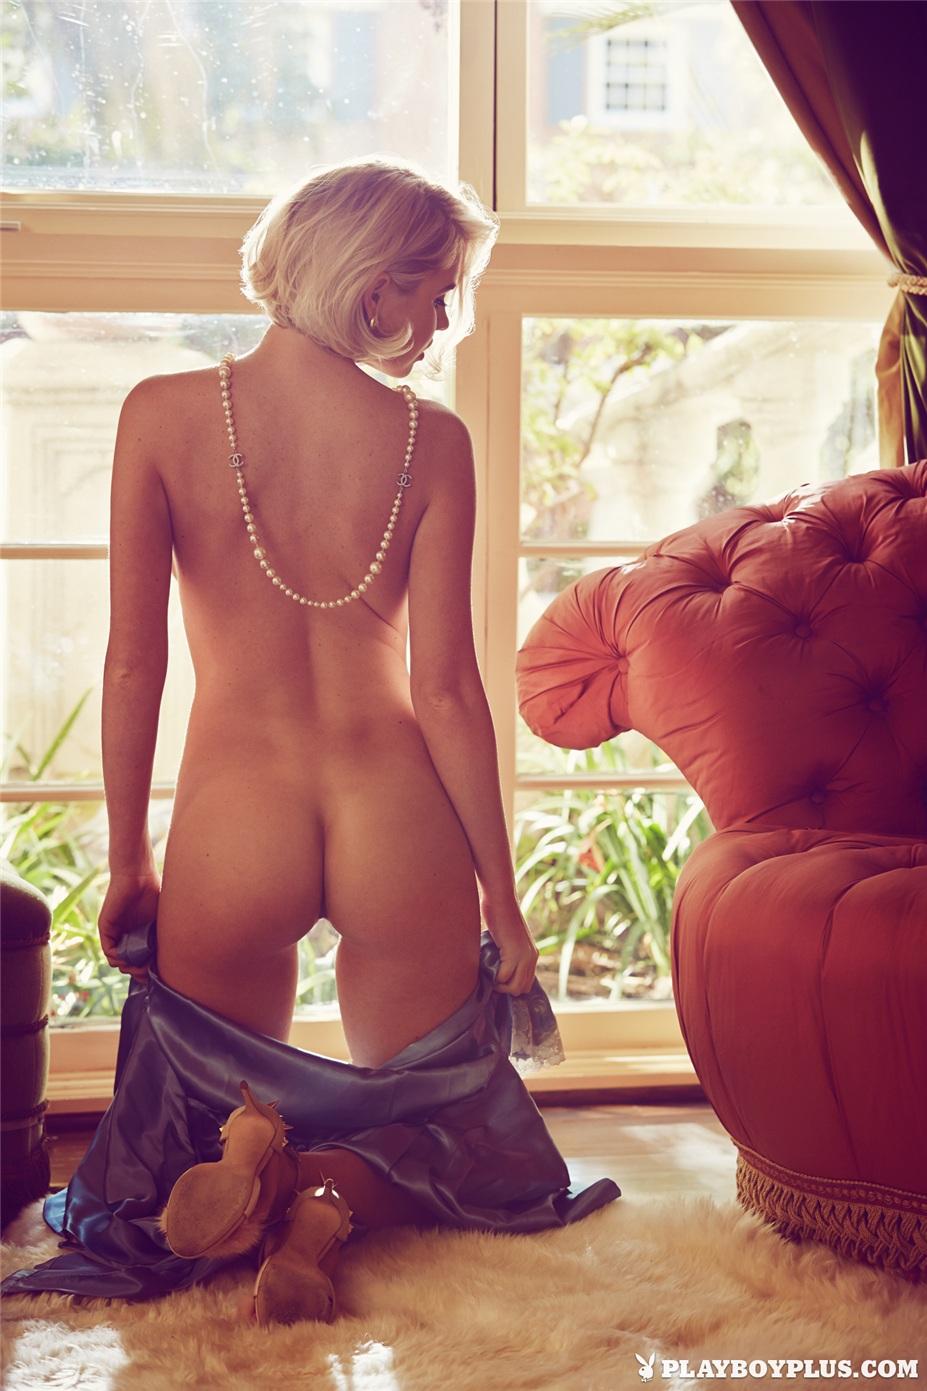 Девушка месяца Кейсли Коллинс / Kayslee Collins - Playboy USA Miss February 2015 / Plush